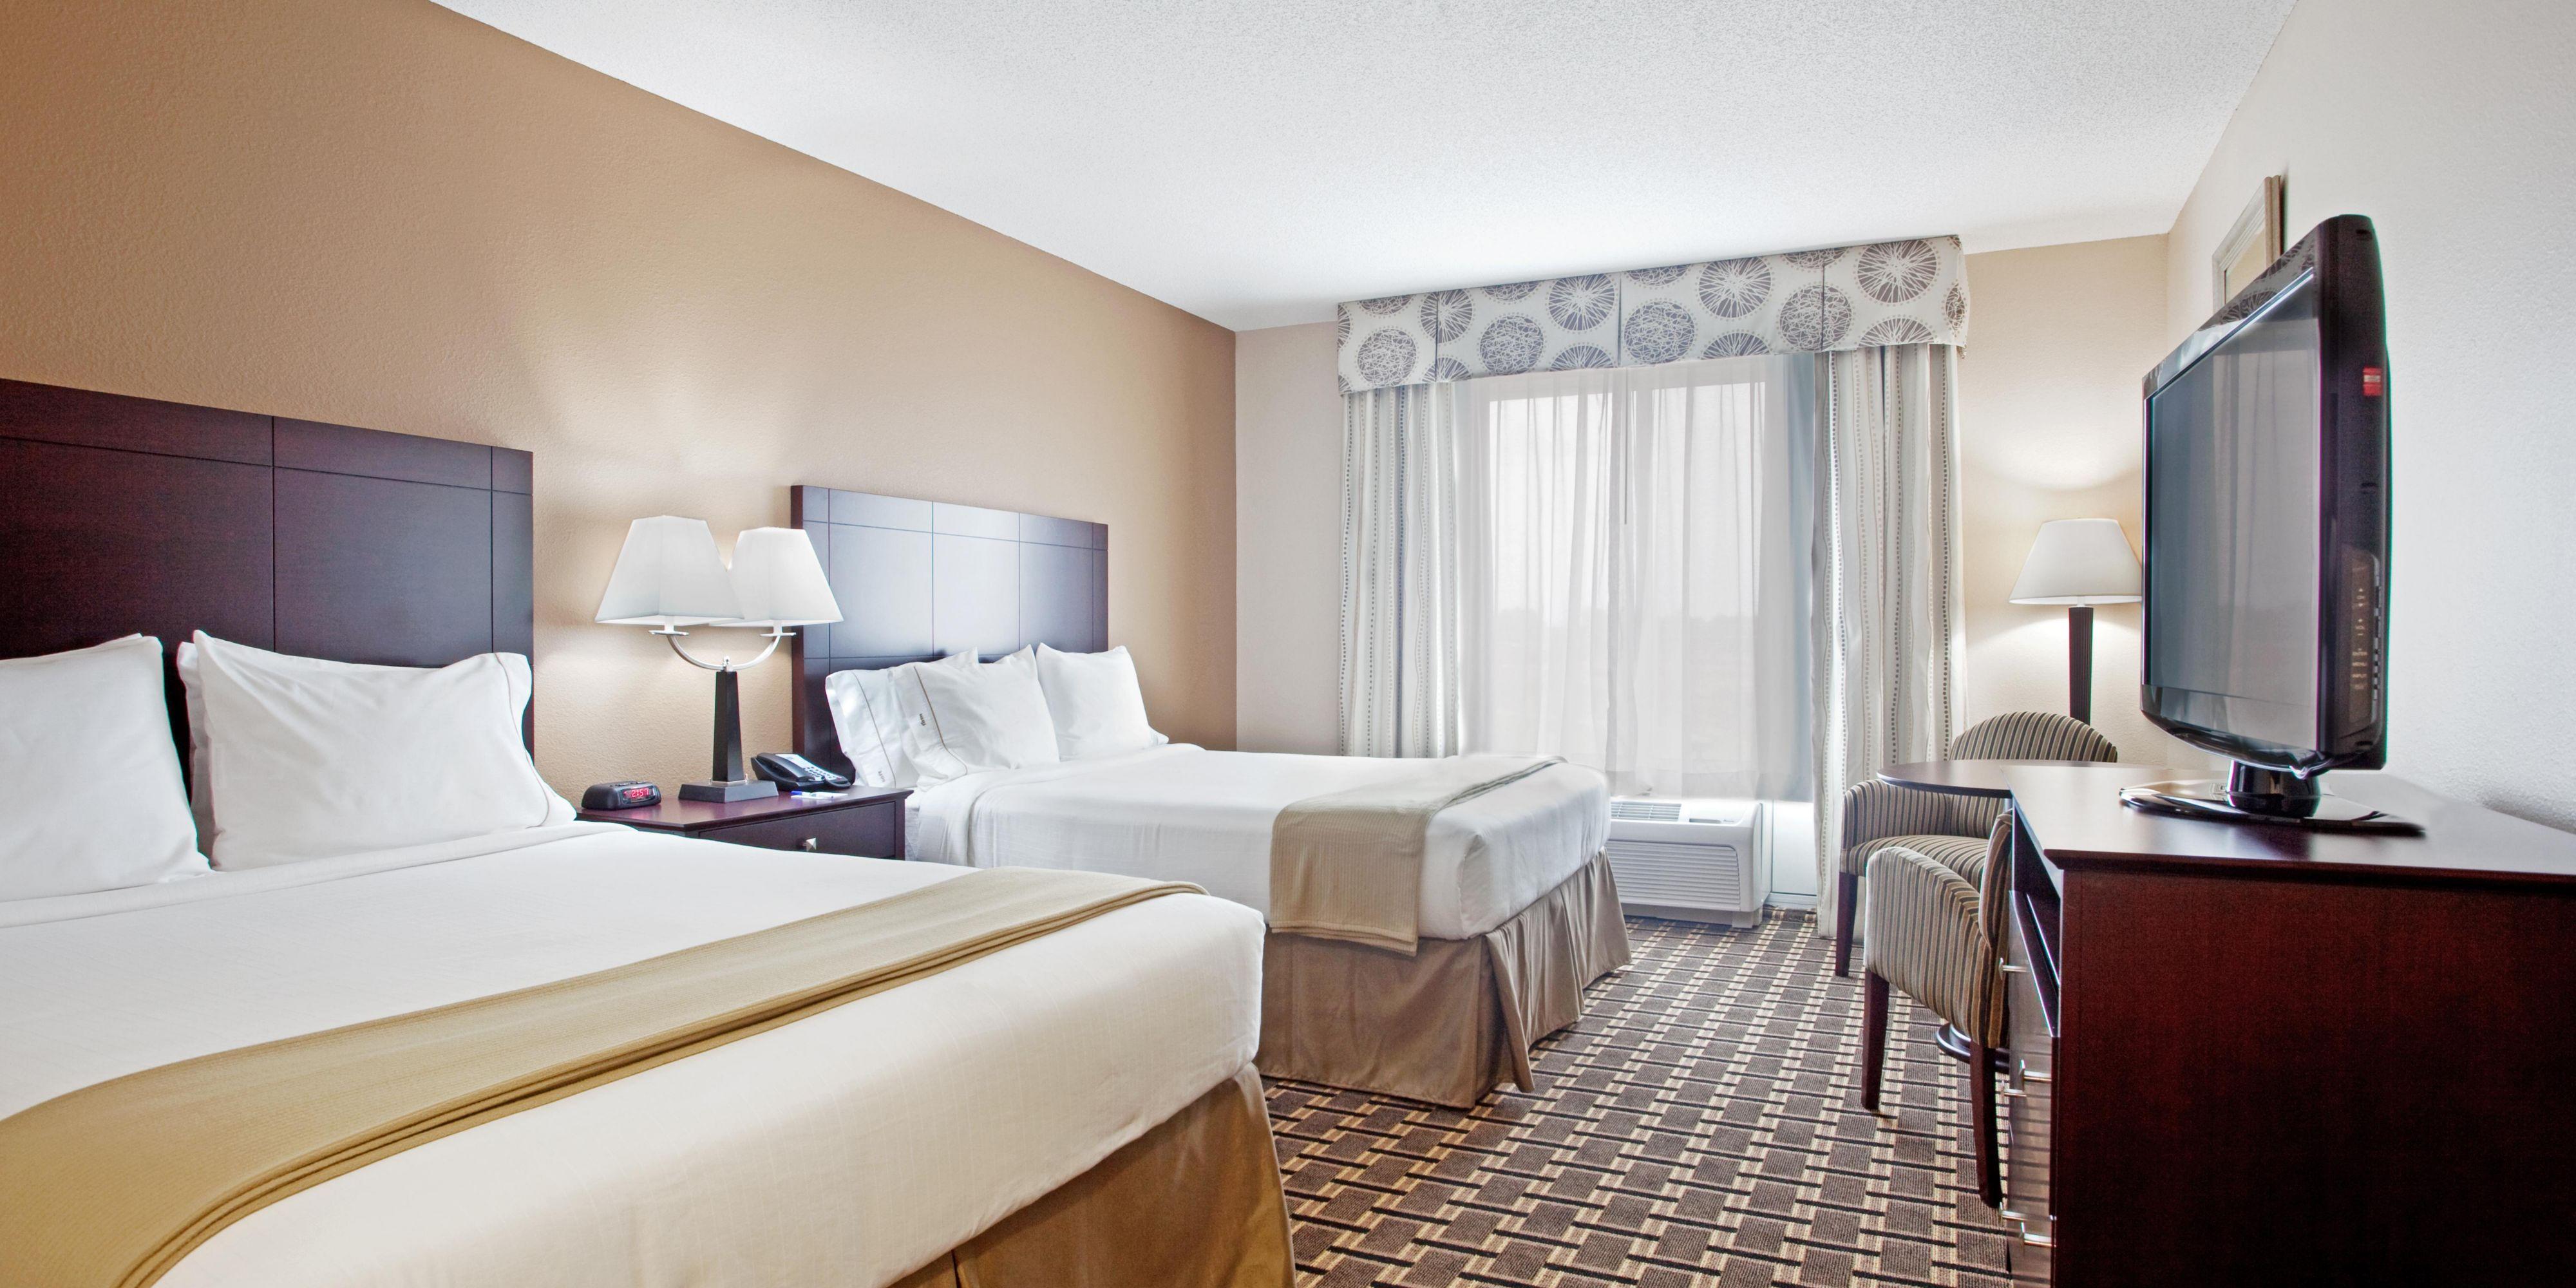 Holiday Inn Express Pembroke Hotel by IHG